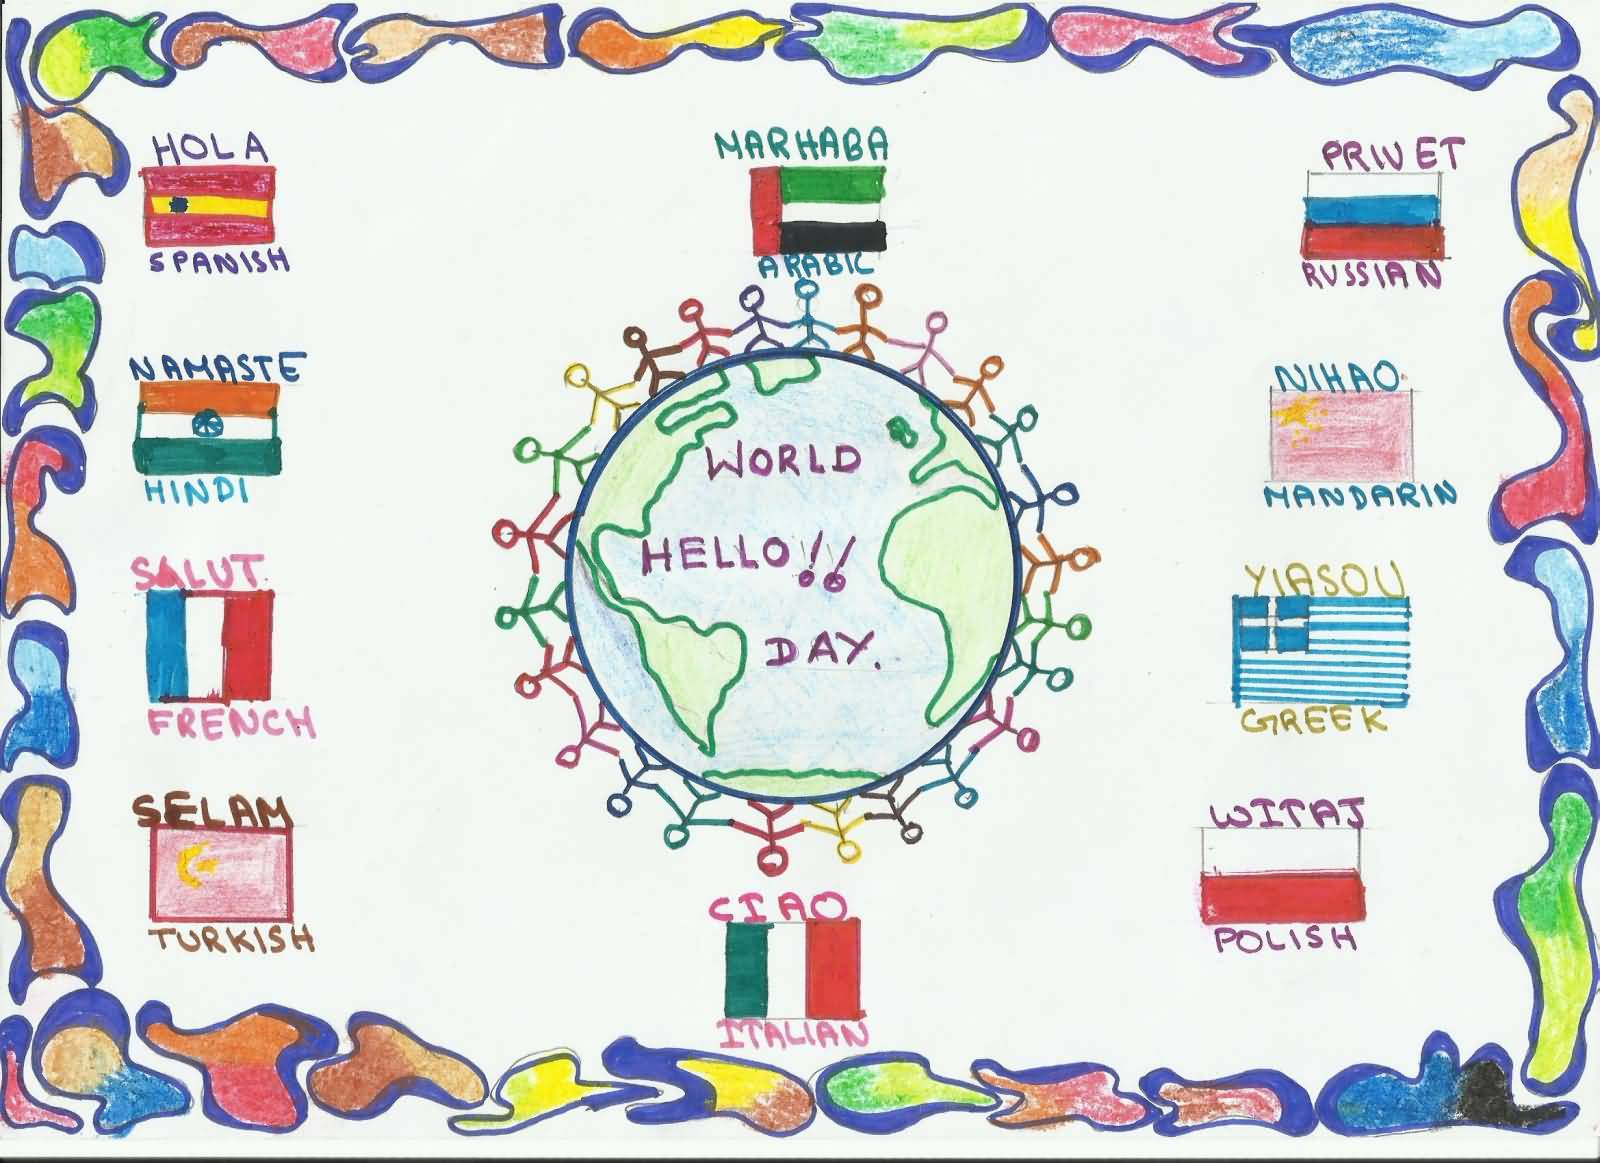 World Hello Day Celebrating Worldwide Picture